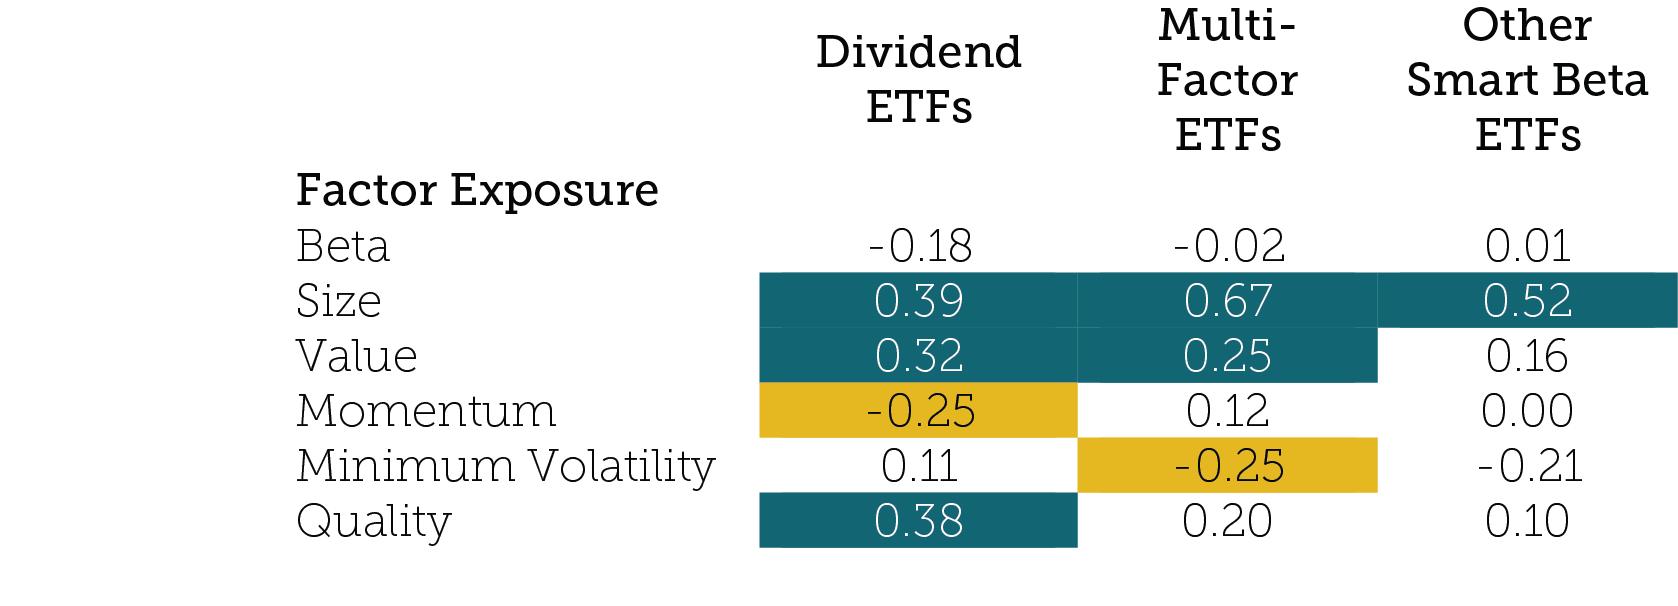 Dividend ETFs